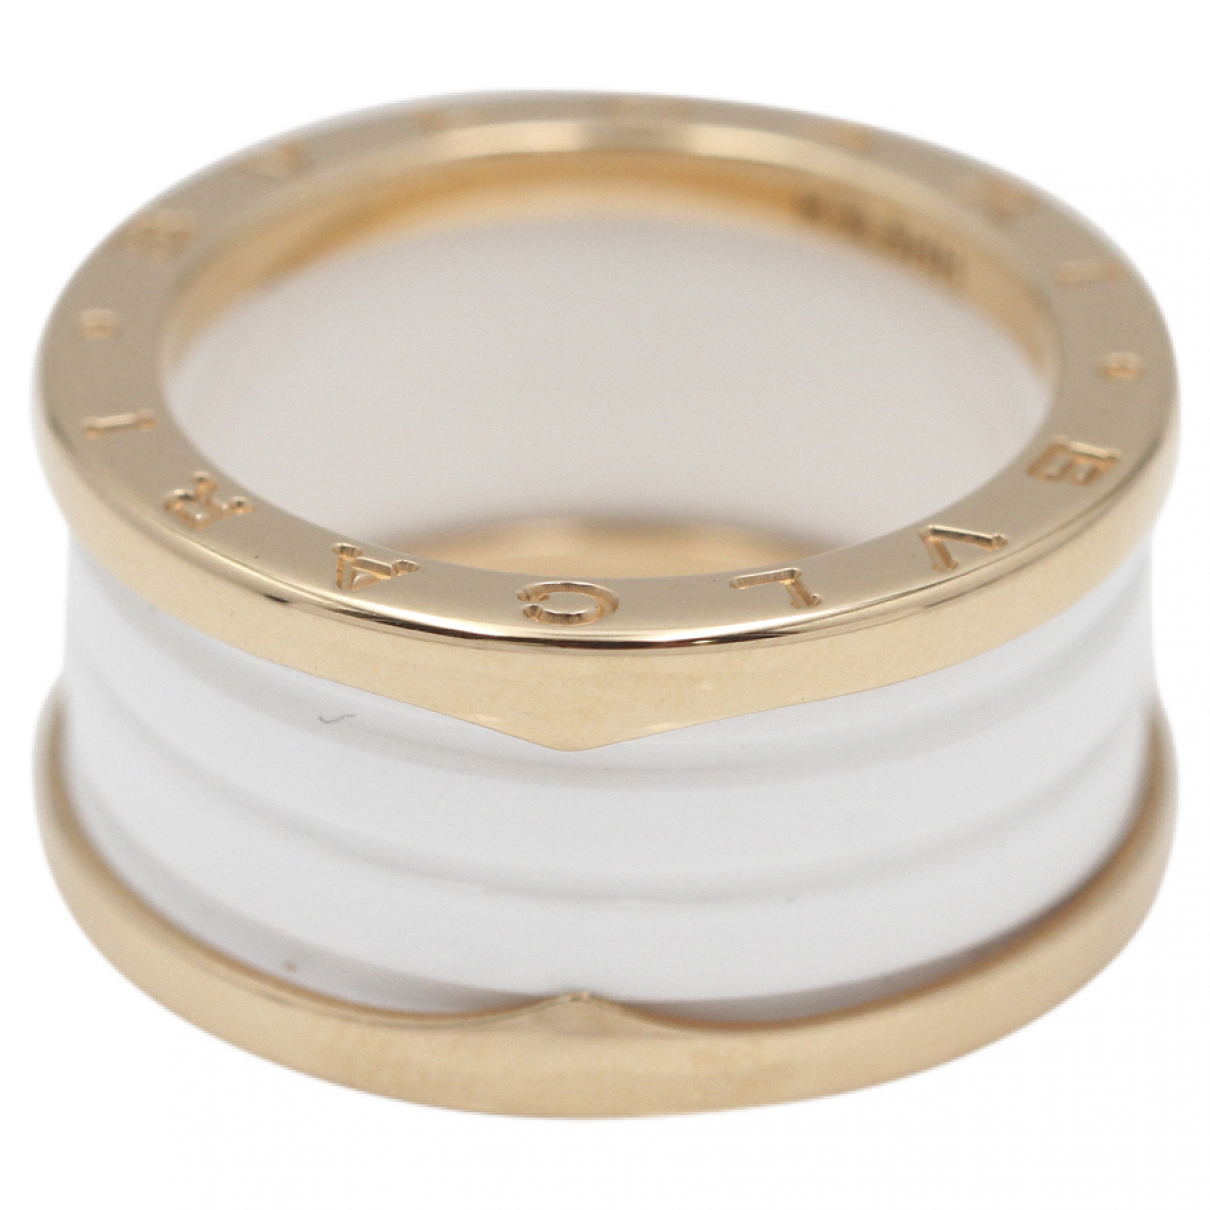 Bvlgari - Bague B.Zero1 pour femme en or rose - blanc